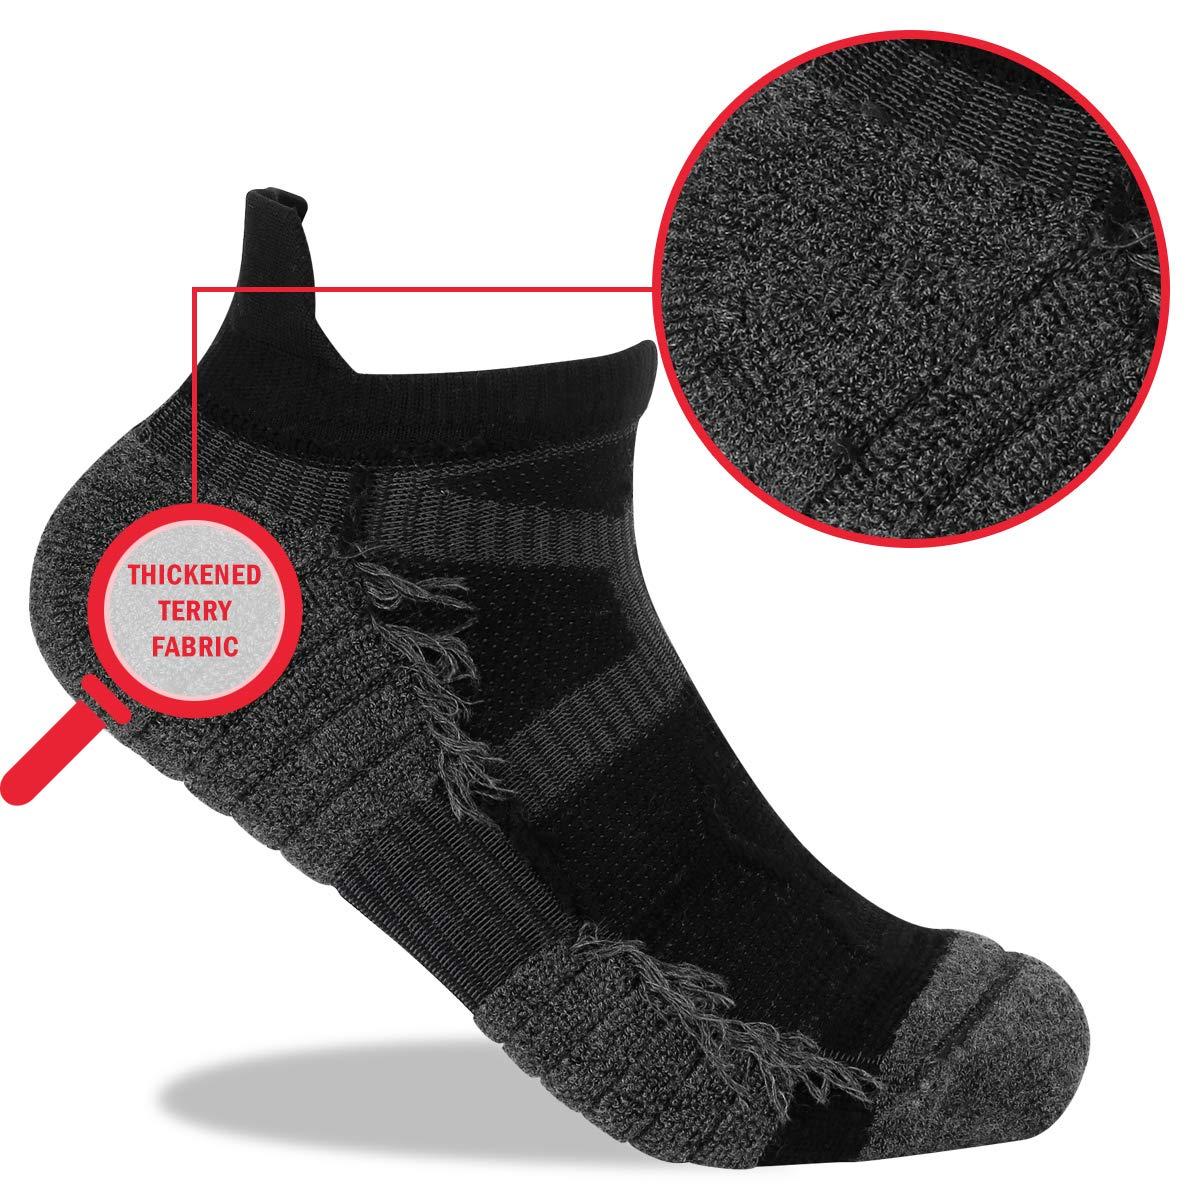 YUEDGE 3 Pares Calcetines Cortos Unisex Invisibles Respirable Calcetines de Deporte Low Cut